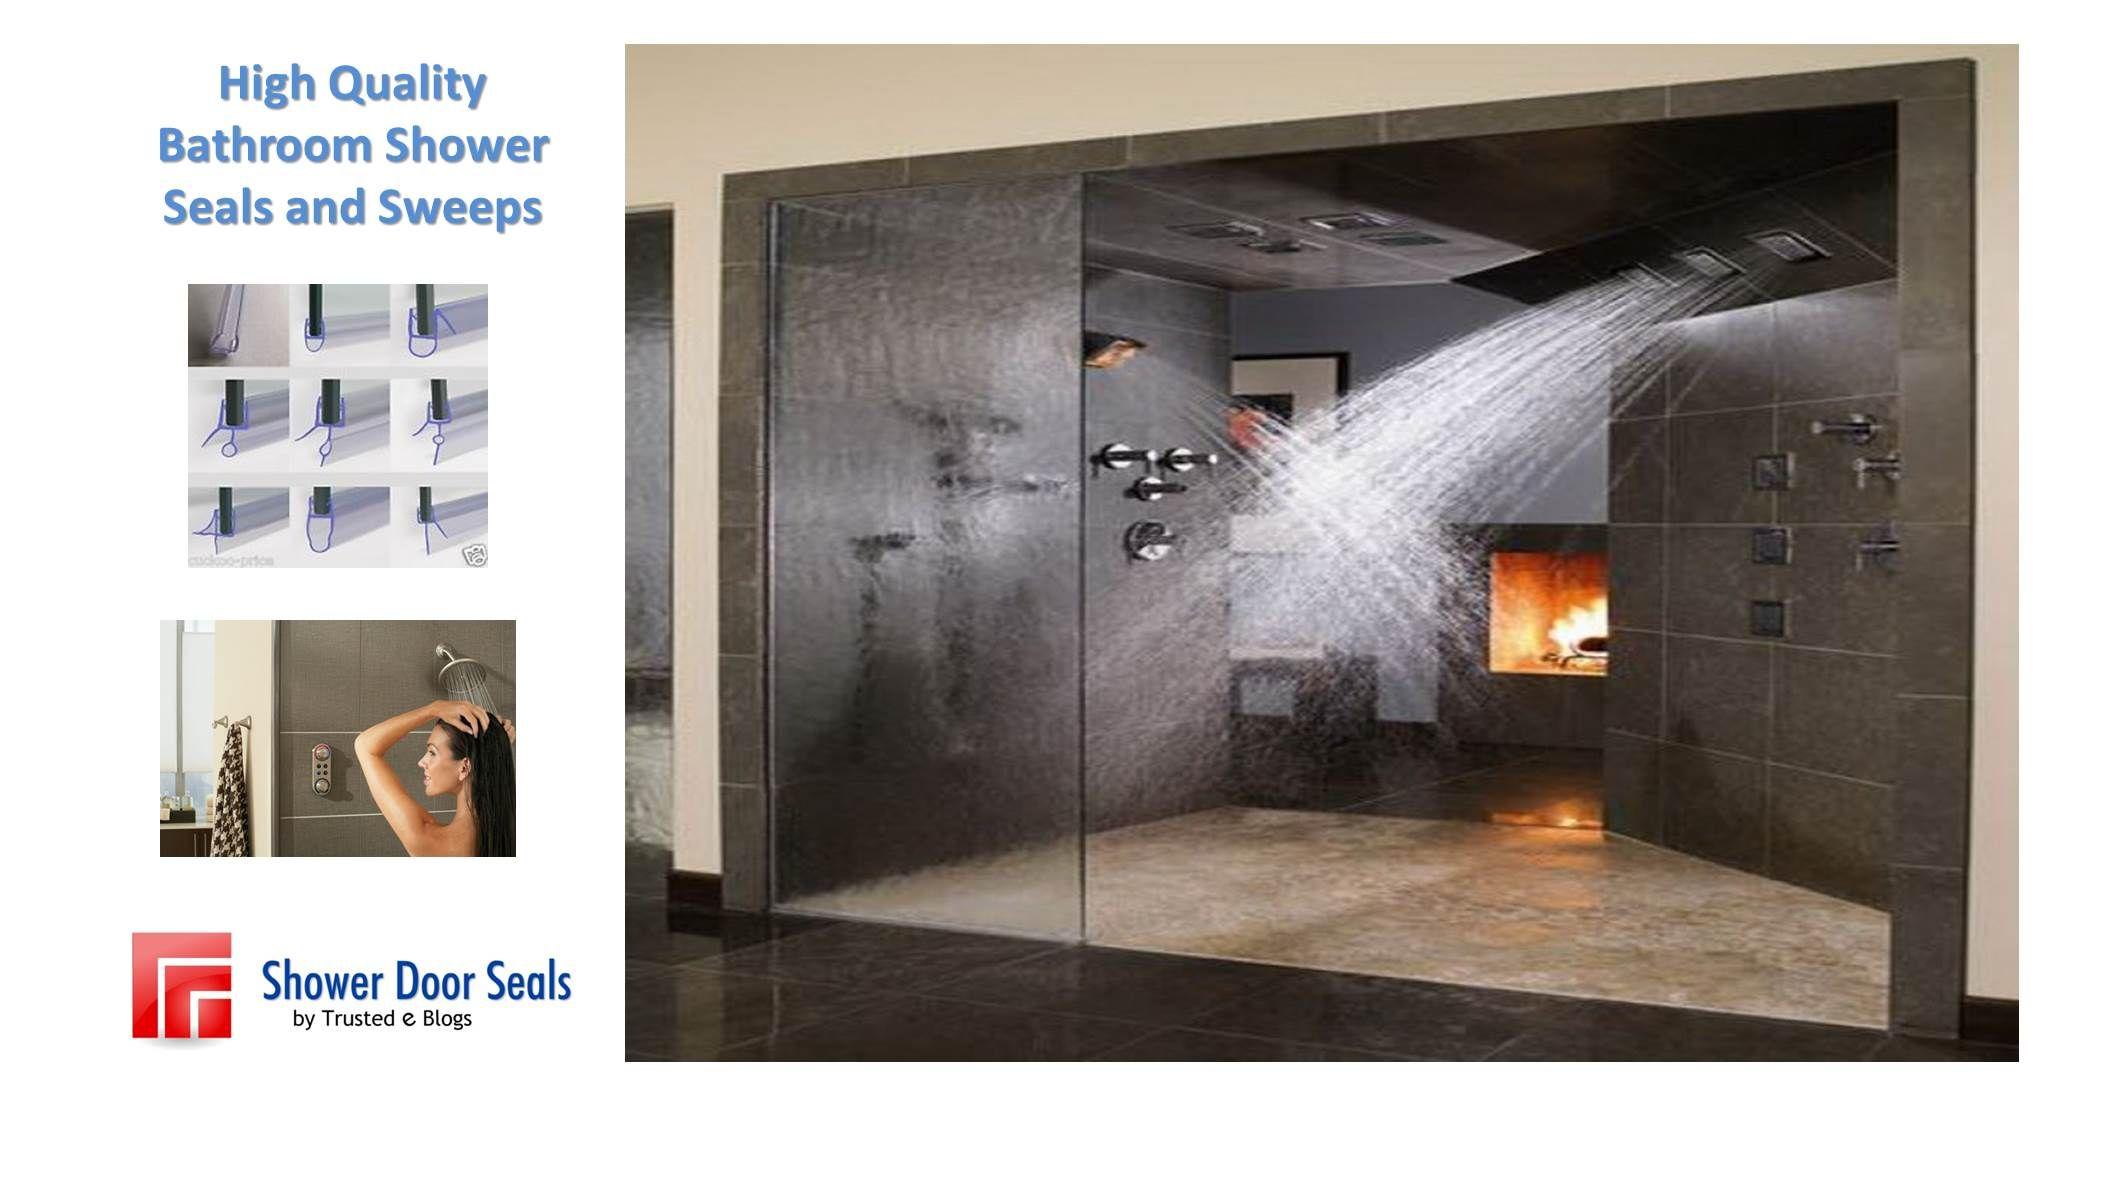 Premium Quality Shower Door Seals And Sweeps Repair Your Shower